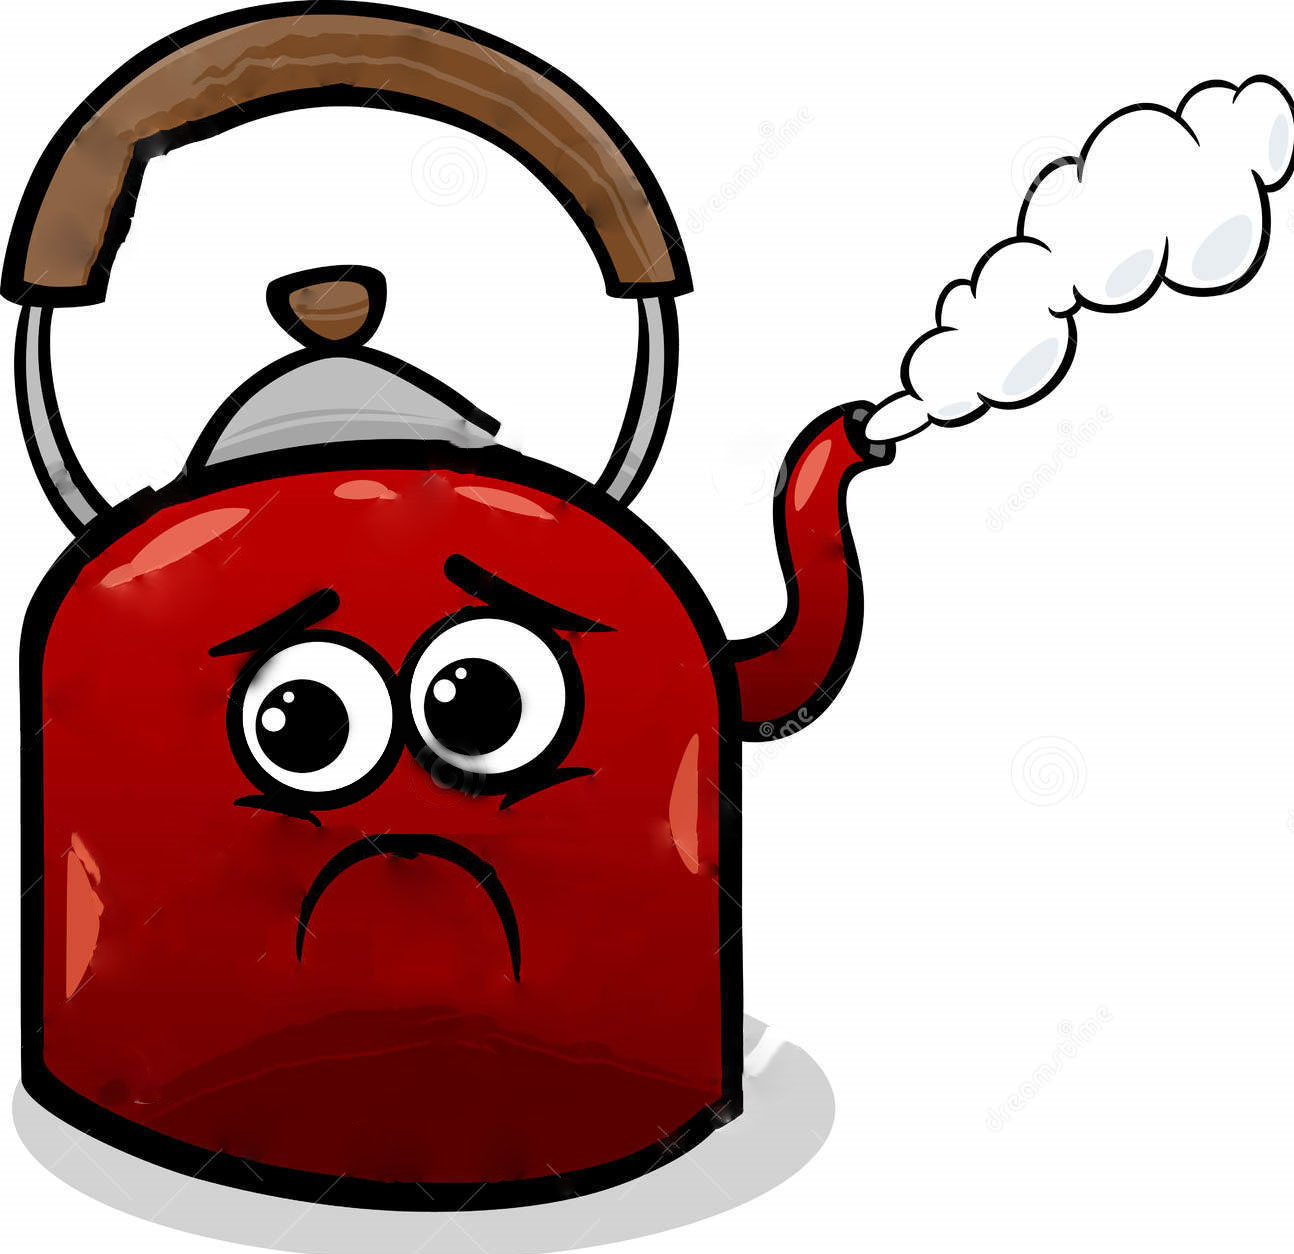 kettle-steam-cartoon-illustration-37614833